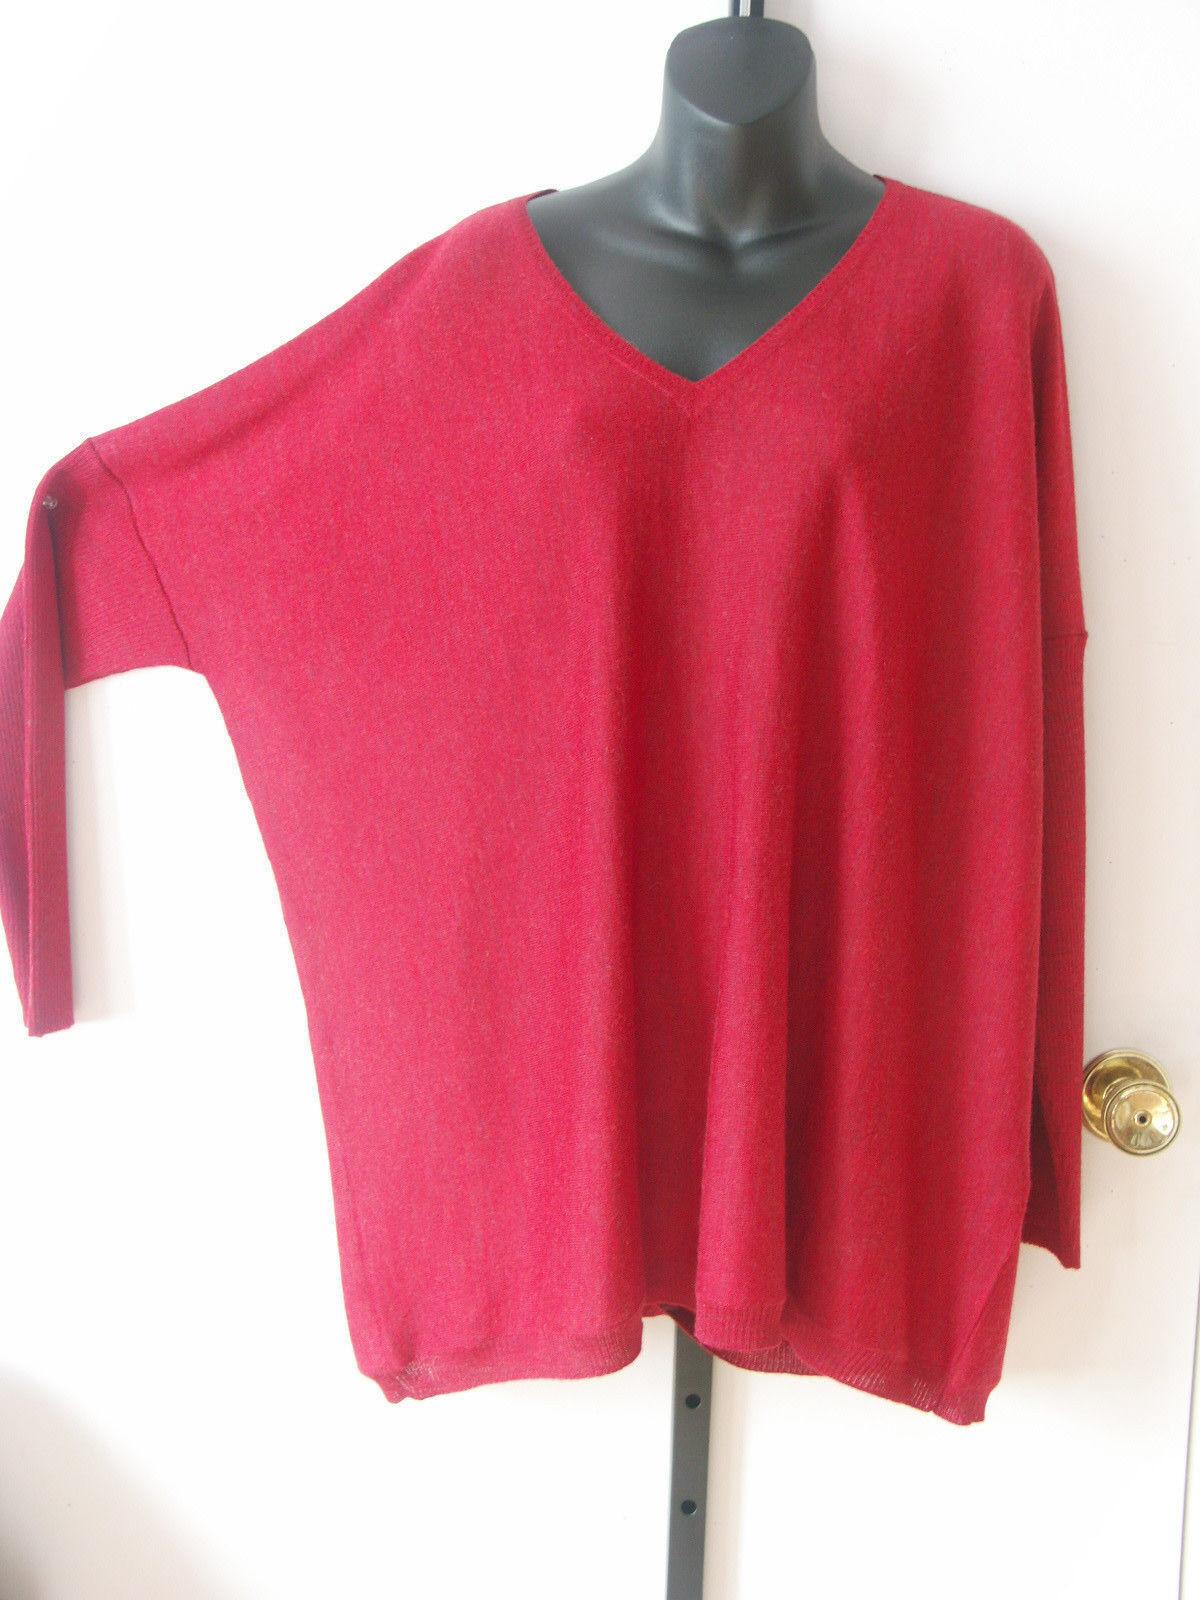 Eileen Fisher NWT  258 258 258 red 100% alpaca dolman sleeves boxy tunic size Large dd7ed6